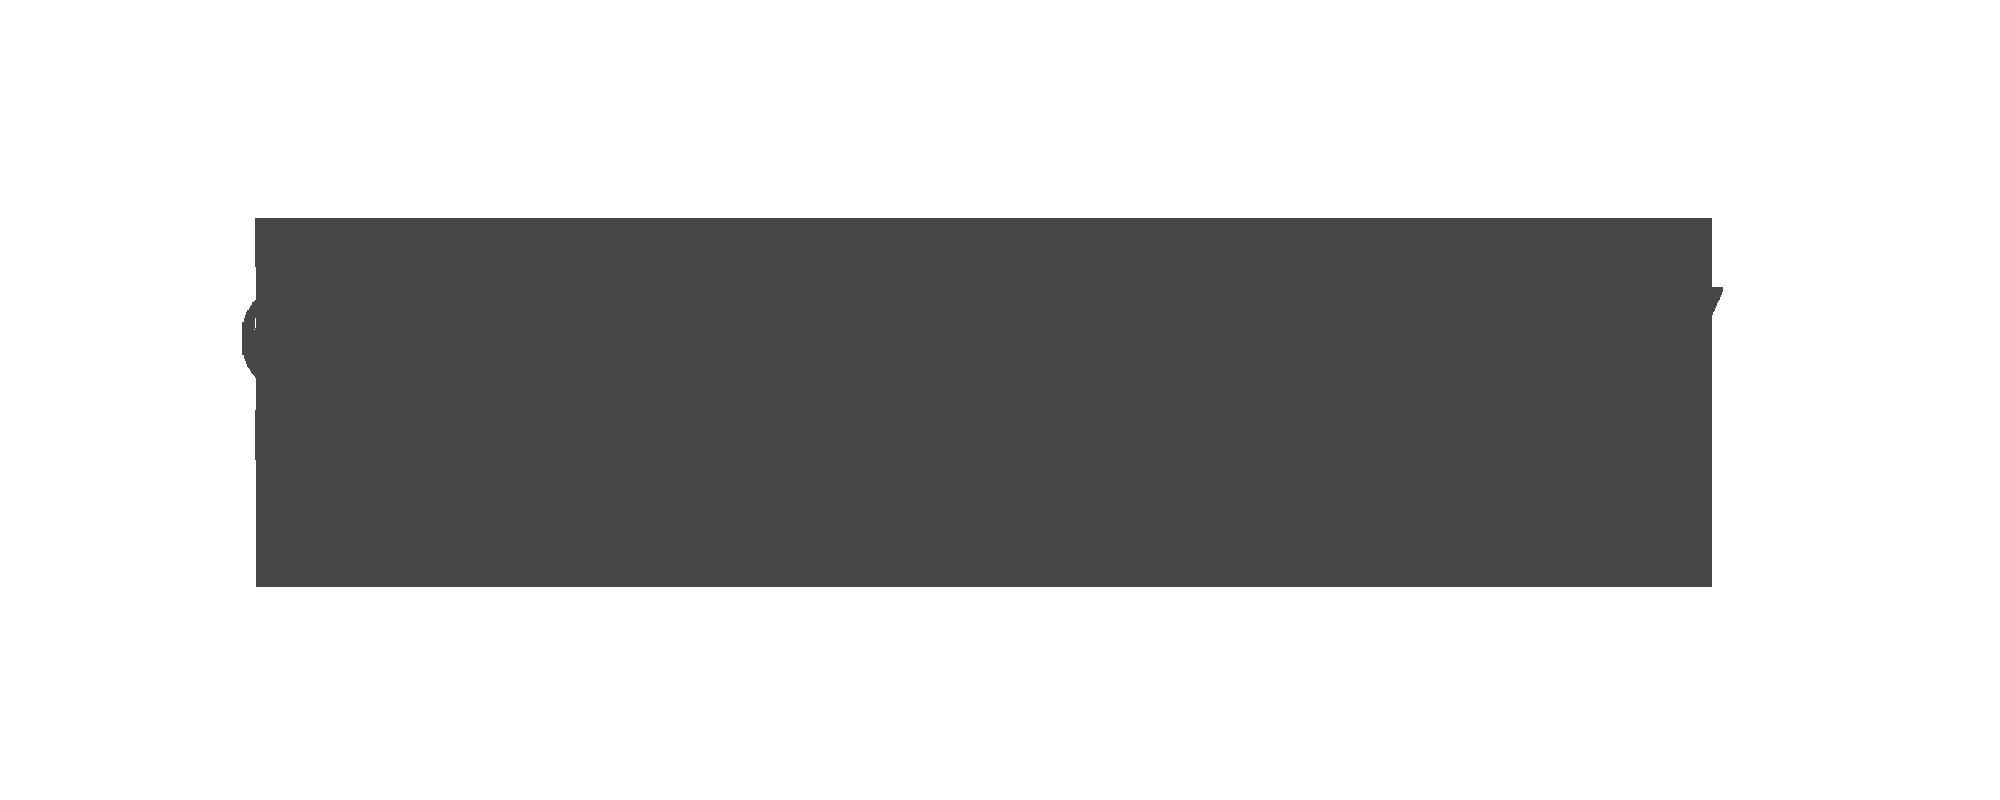 https://www.hybrisonline.com/pub_docs/files/Mer/Logoline_Discovery_20x8.png